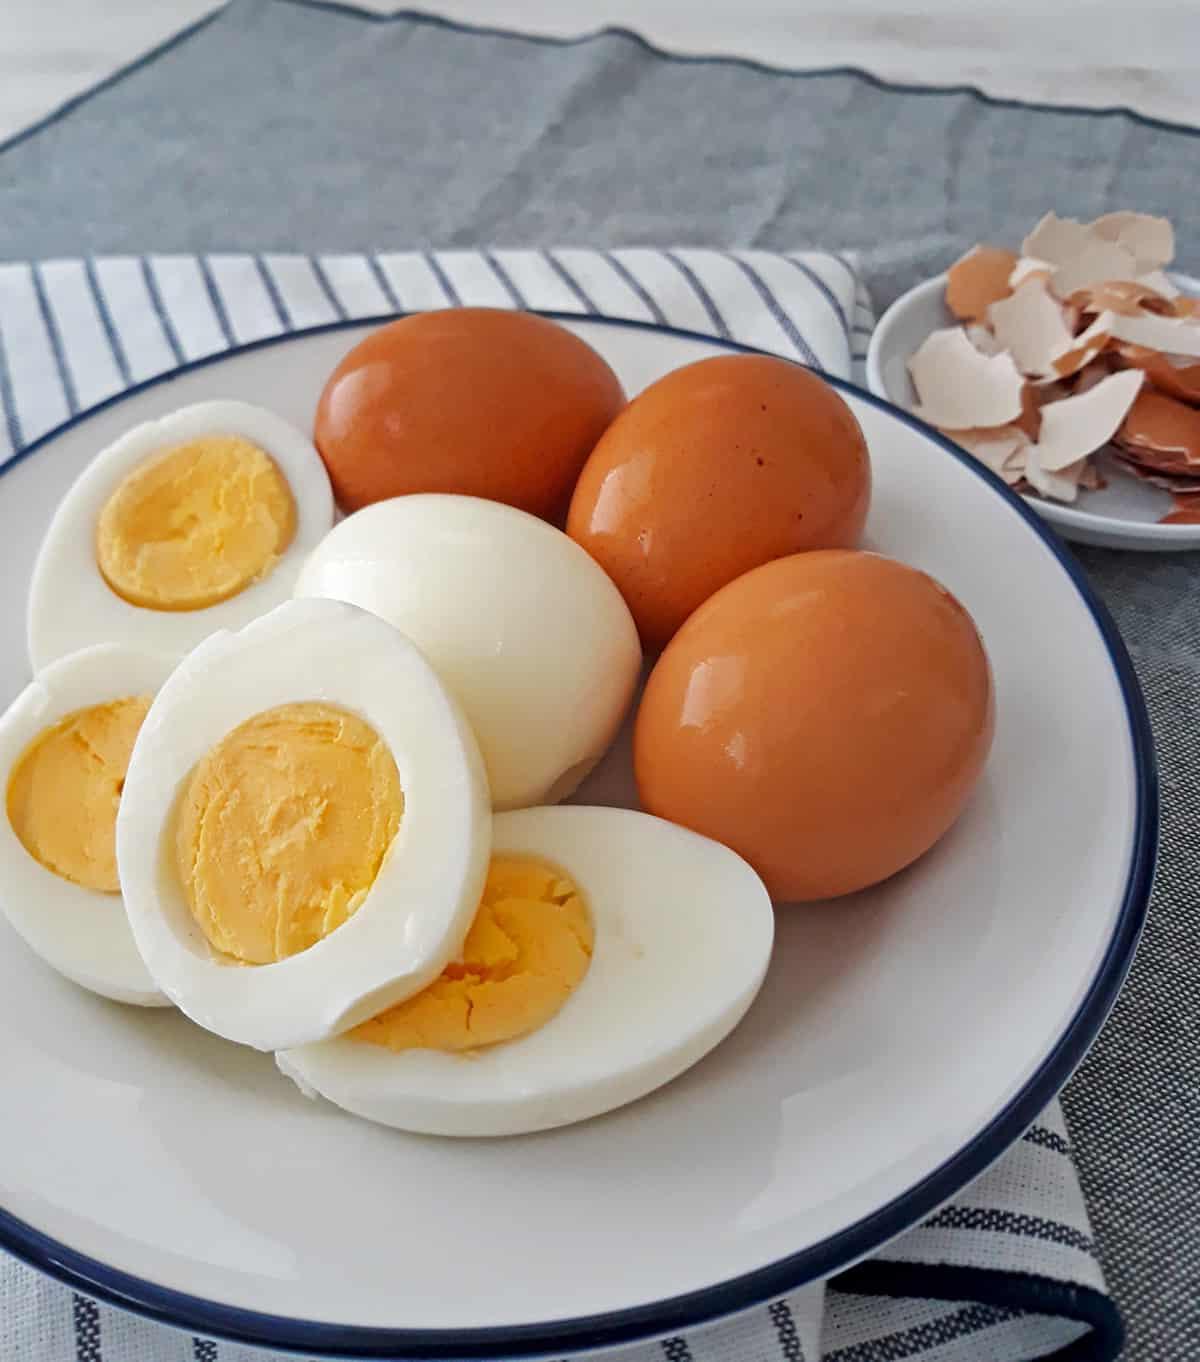 huevos cocidos en plato blanco